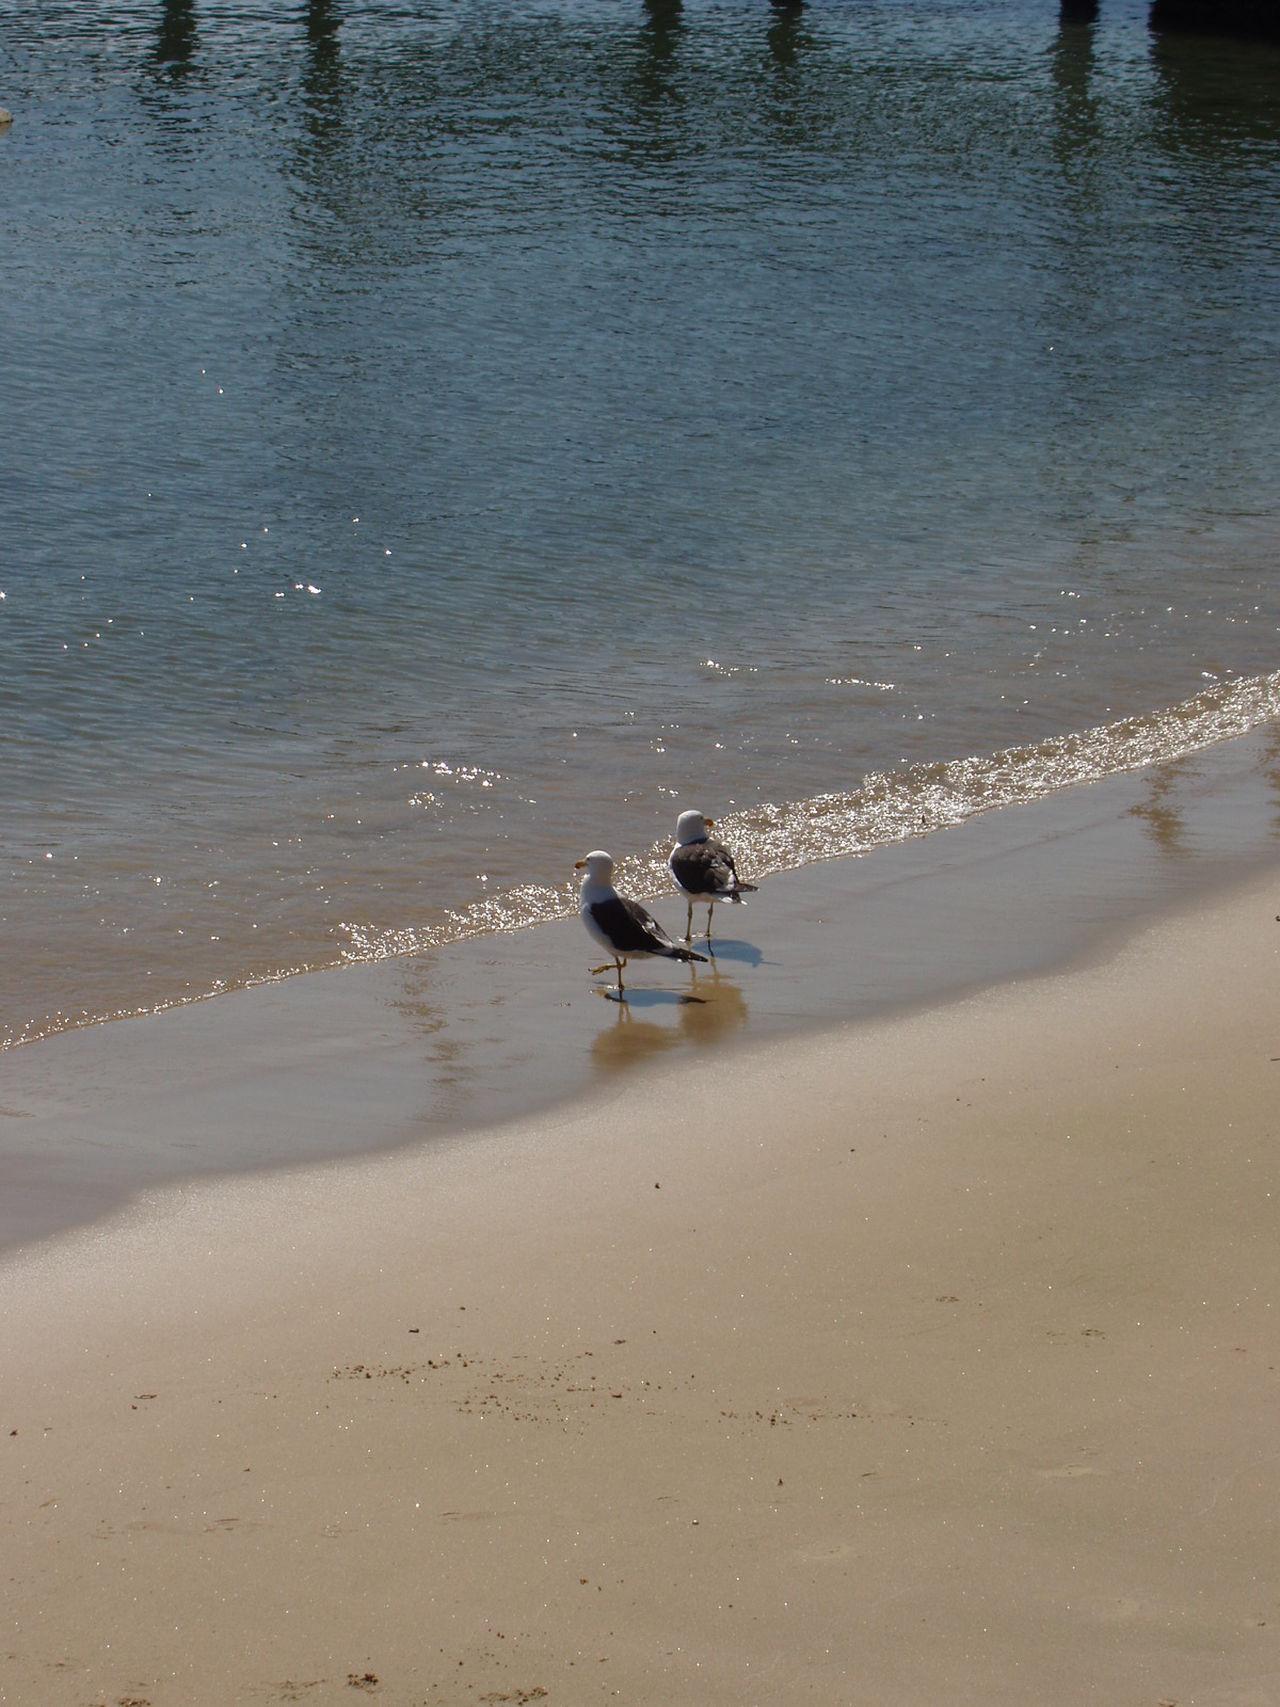 Beach Buzios Buziosrj Sand Seagull Seagull Serenity Seagulls And Sea Travel Walking Water Learn & Shoot: Leading Lines Learn & Shoot: Simplicity Litoralbrasileiro Litoralcarioca Buzios-RJ ExploringBrazil Two Is Better Than One